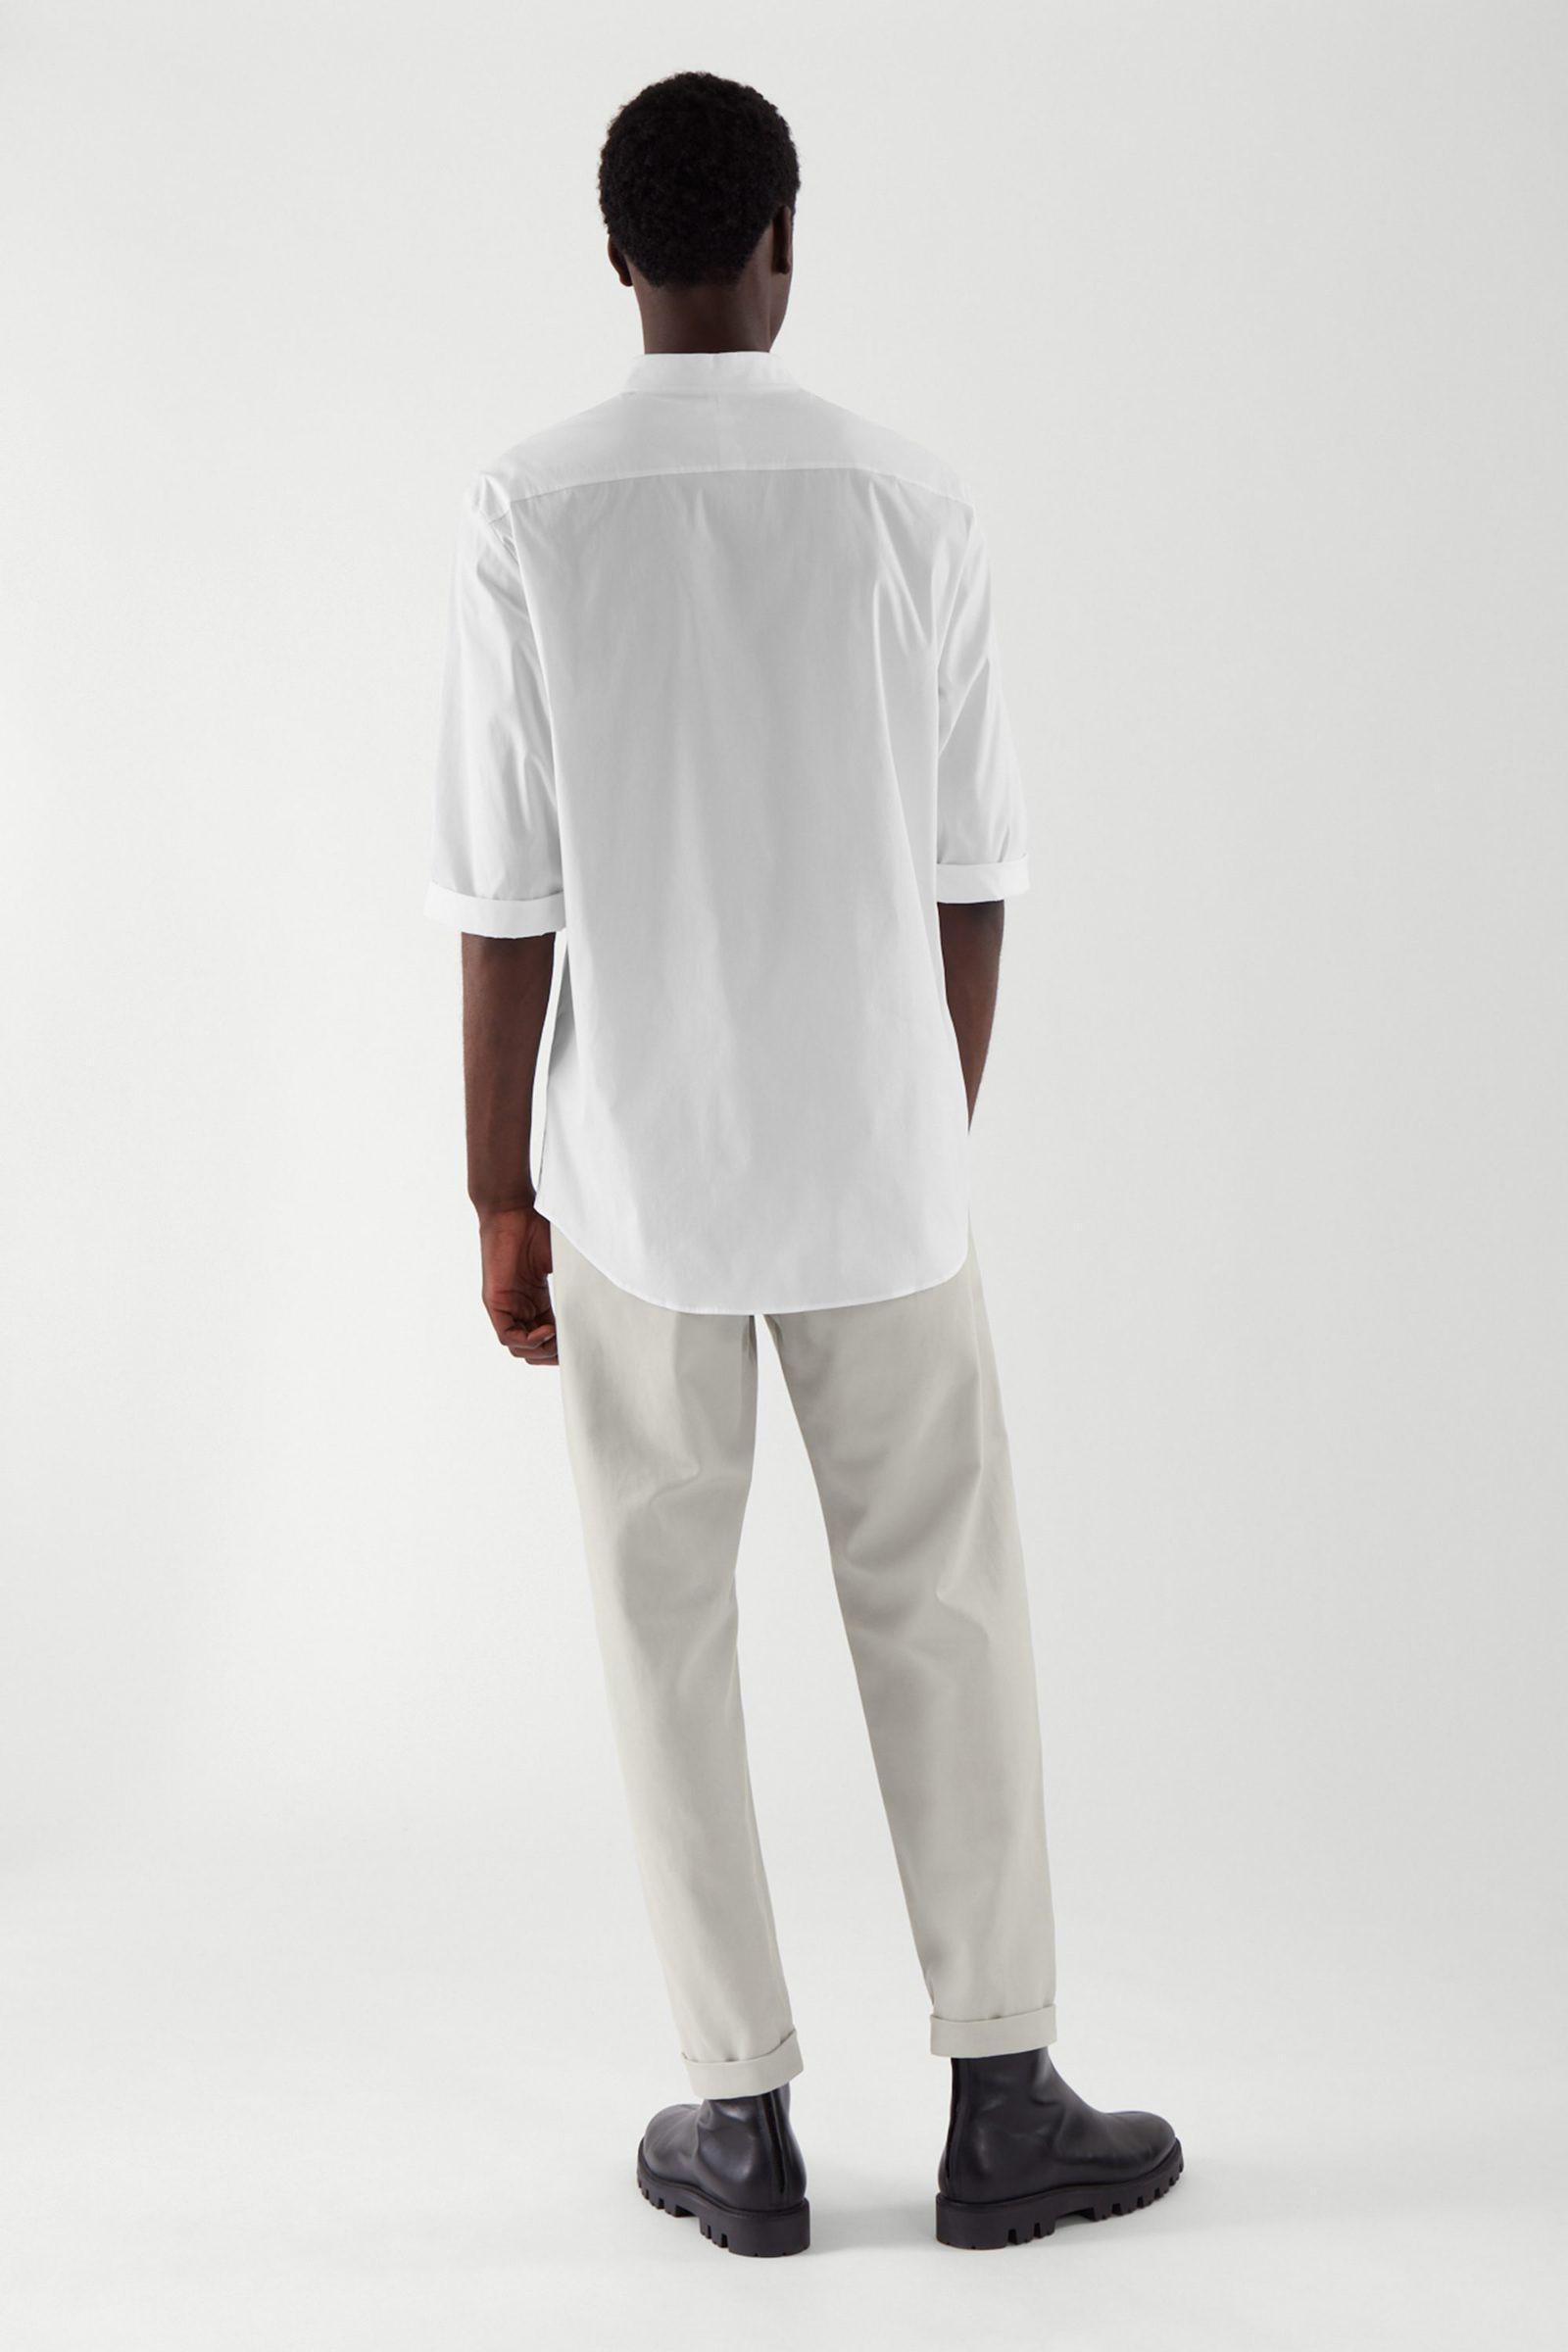 COS 슬림 칼라리스 셔츠의 화이트컬러 ECOMLook입니다.